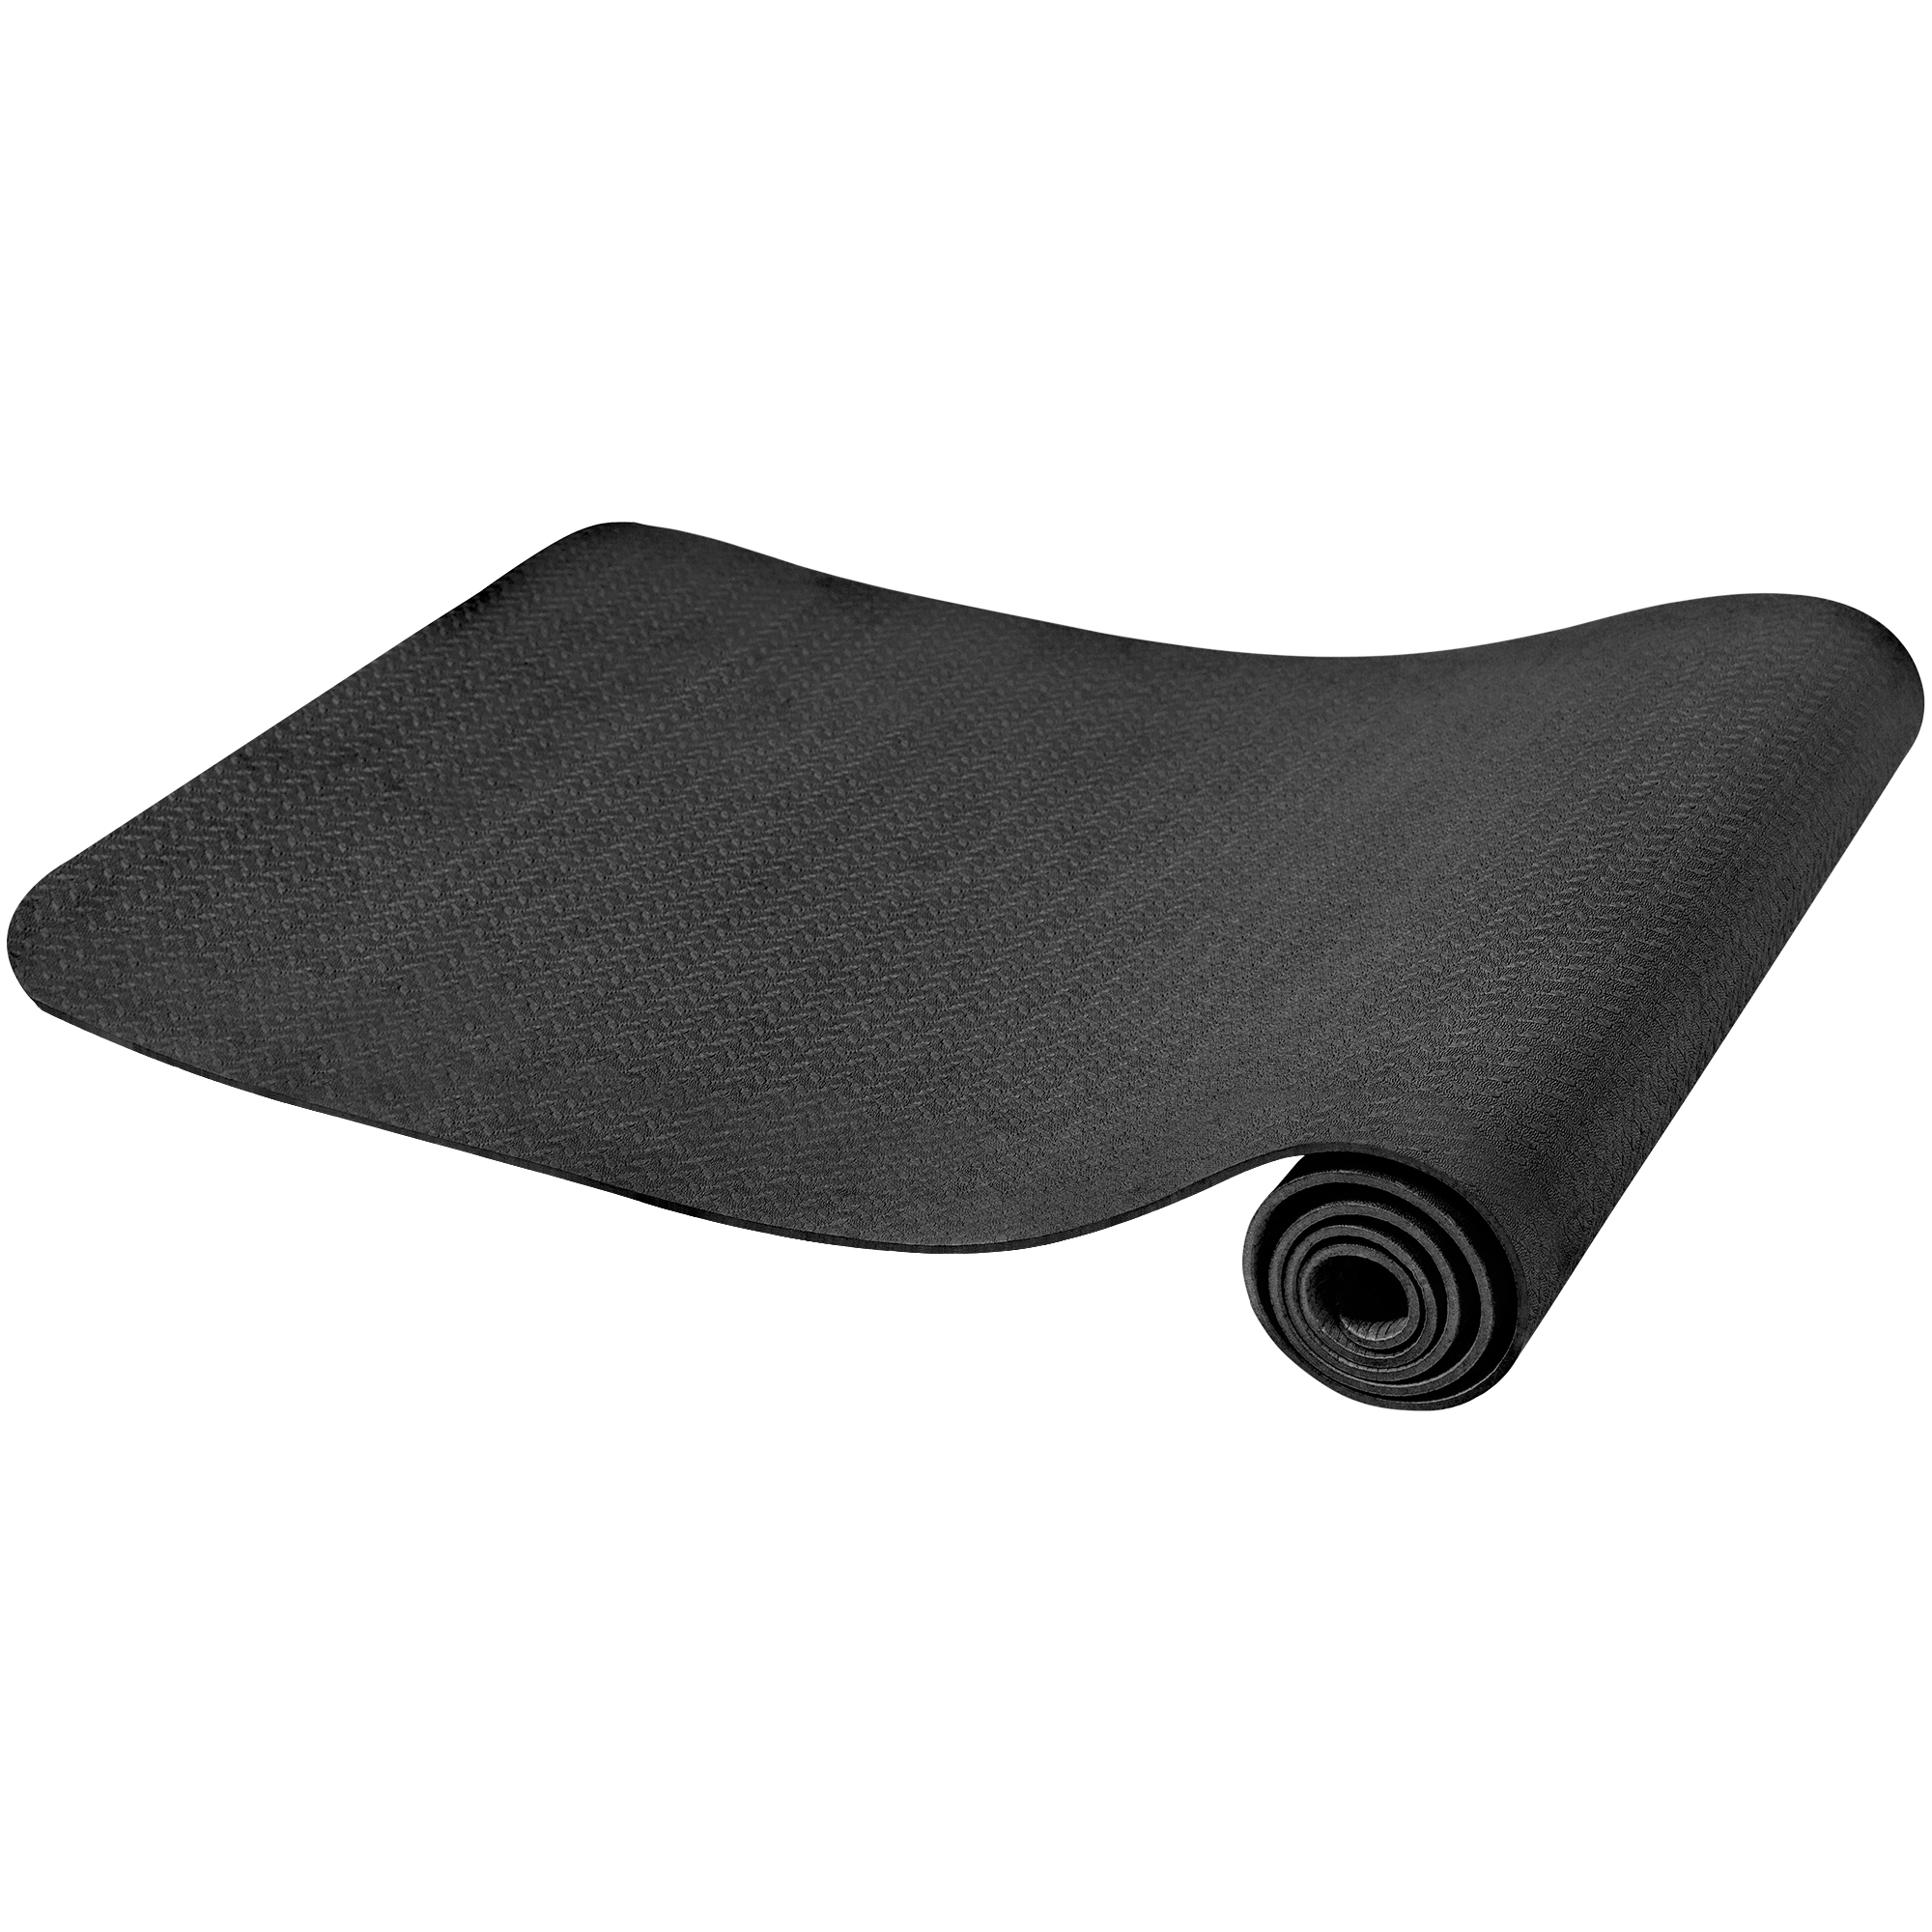 Gorilla Sports Yogamatte Dünn Schwarz 4 mm 100815-00019-0071